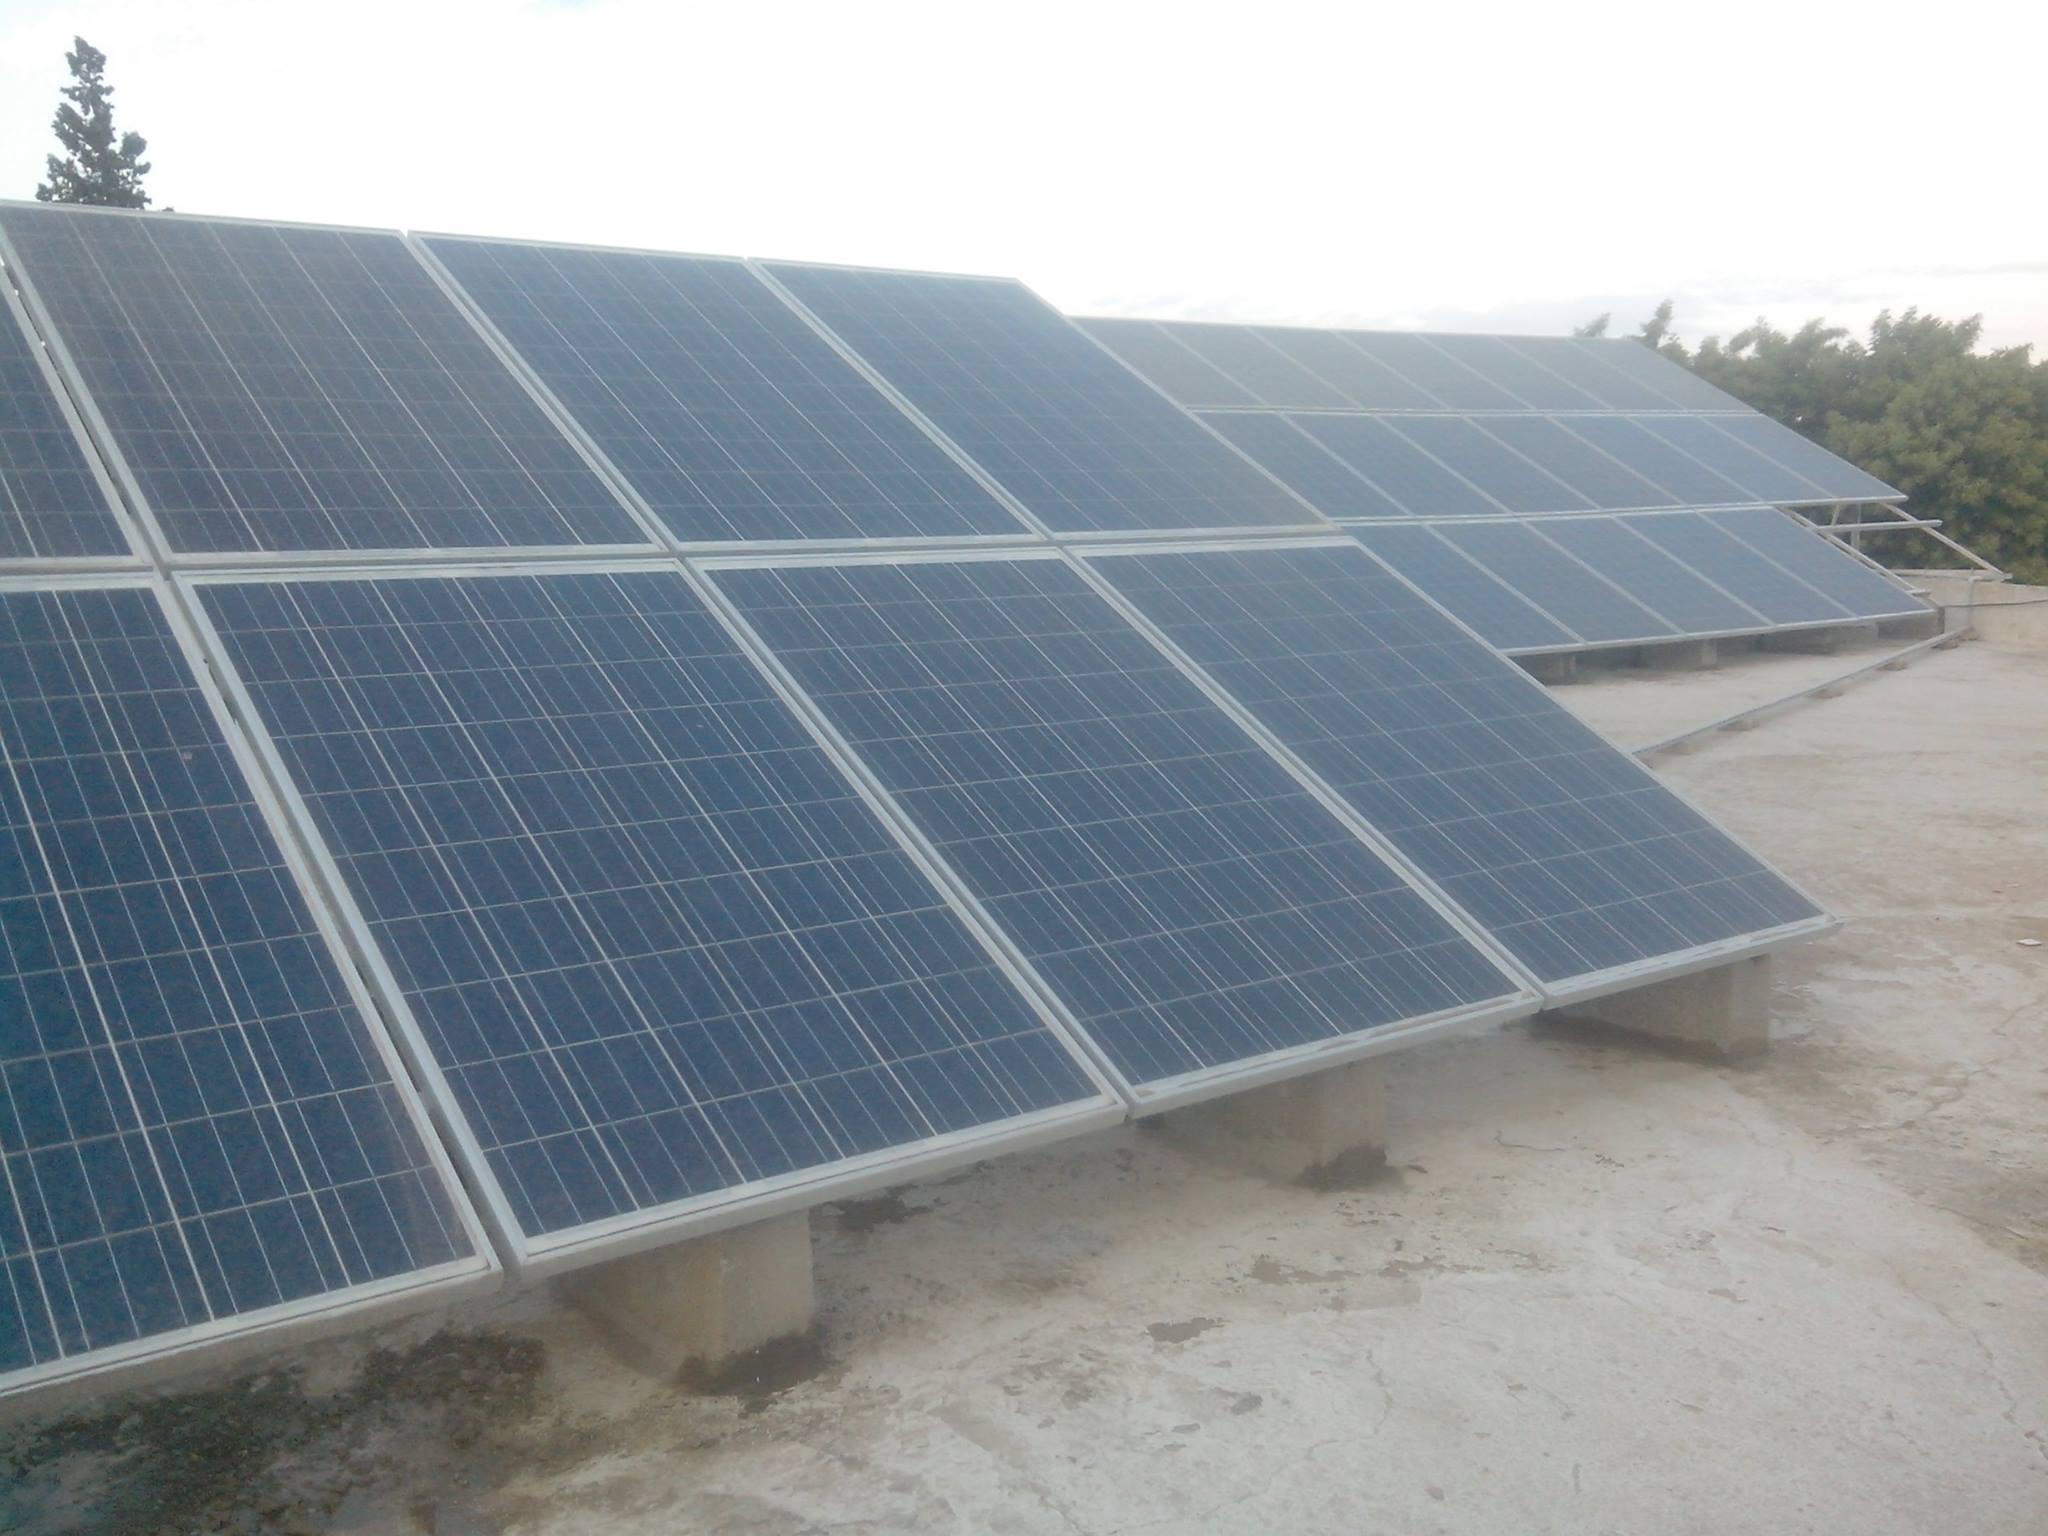 nstallation-photovoltaïque-Raccordee reseau d'une-puissance-12.Kwc-SAGAZ-POUDRIERE-SFAX-TUNISIE-Societe-SOLIDER 1